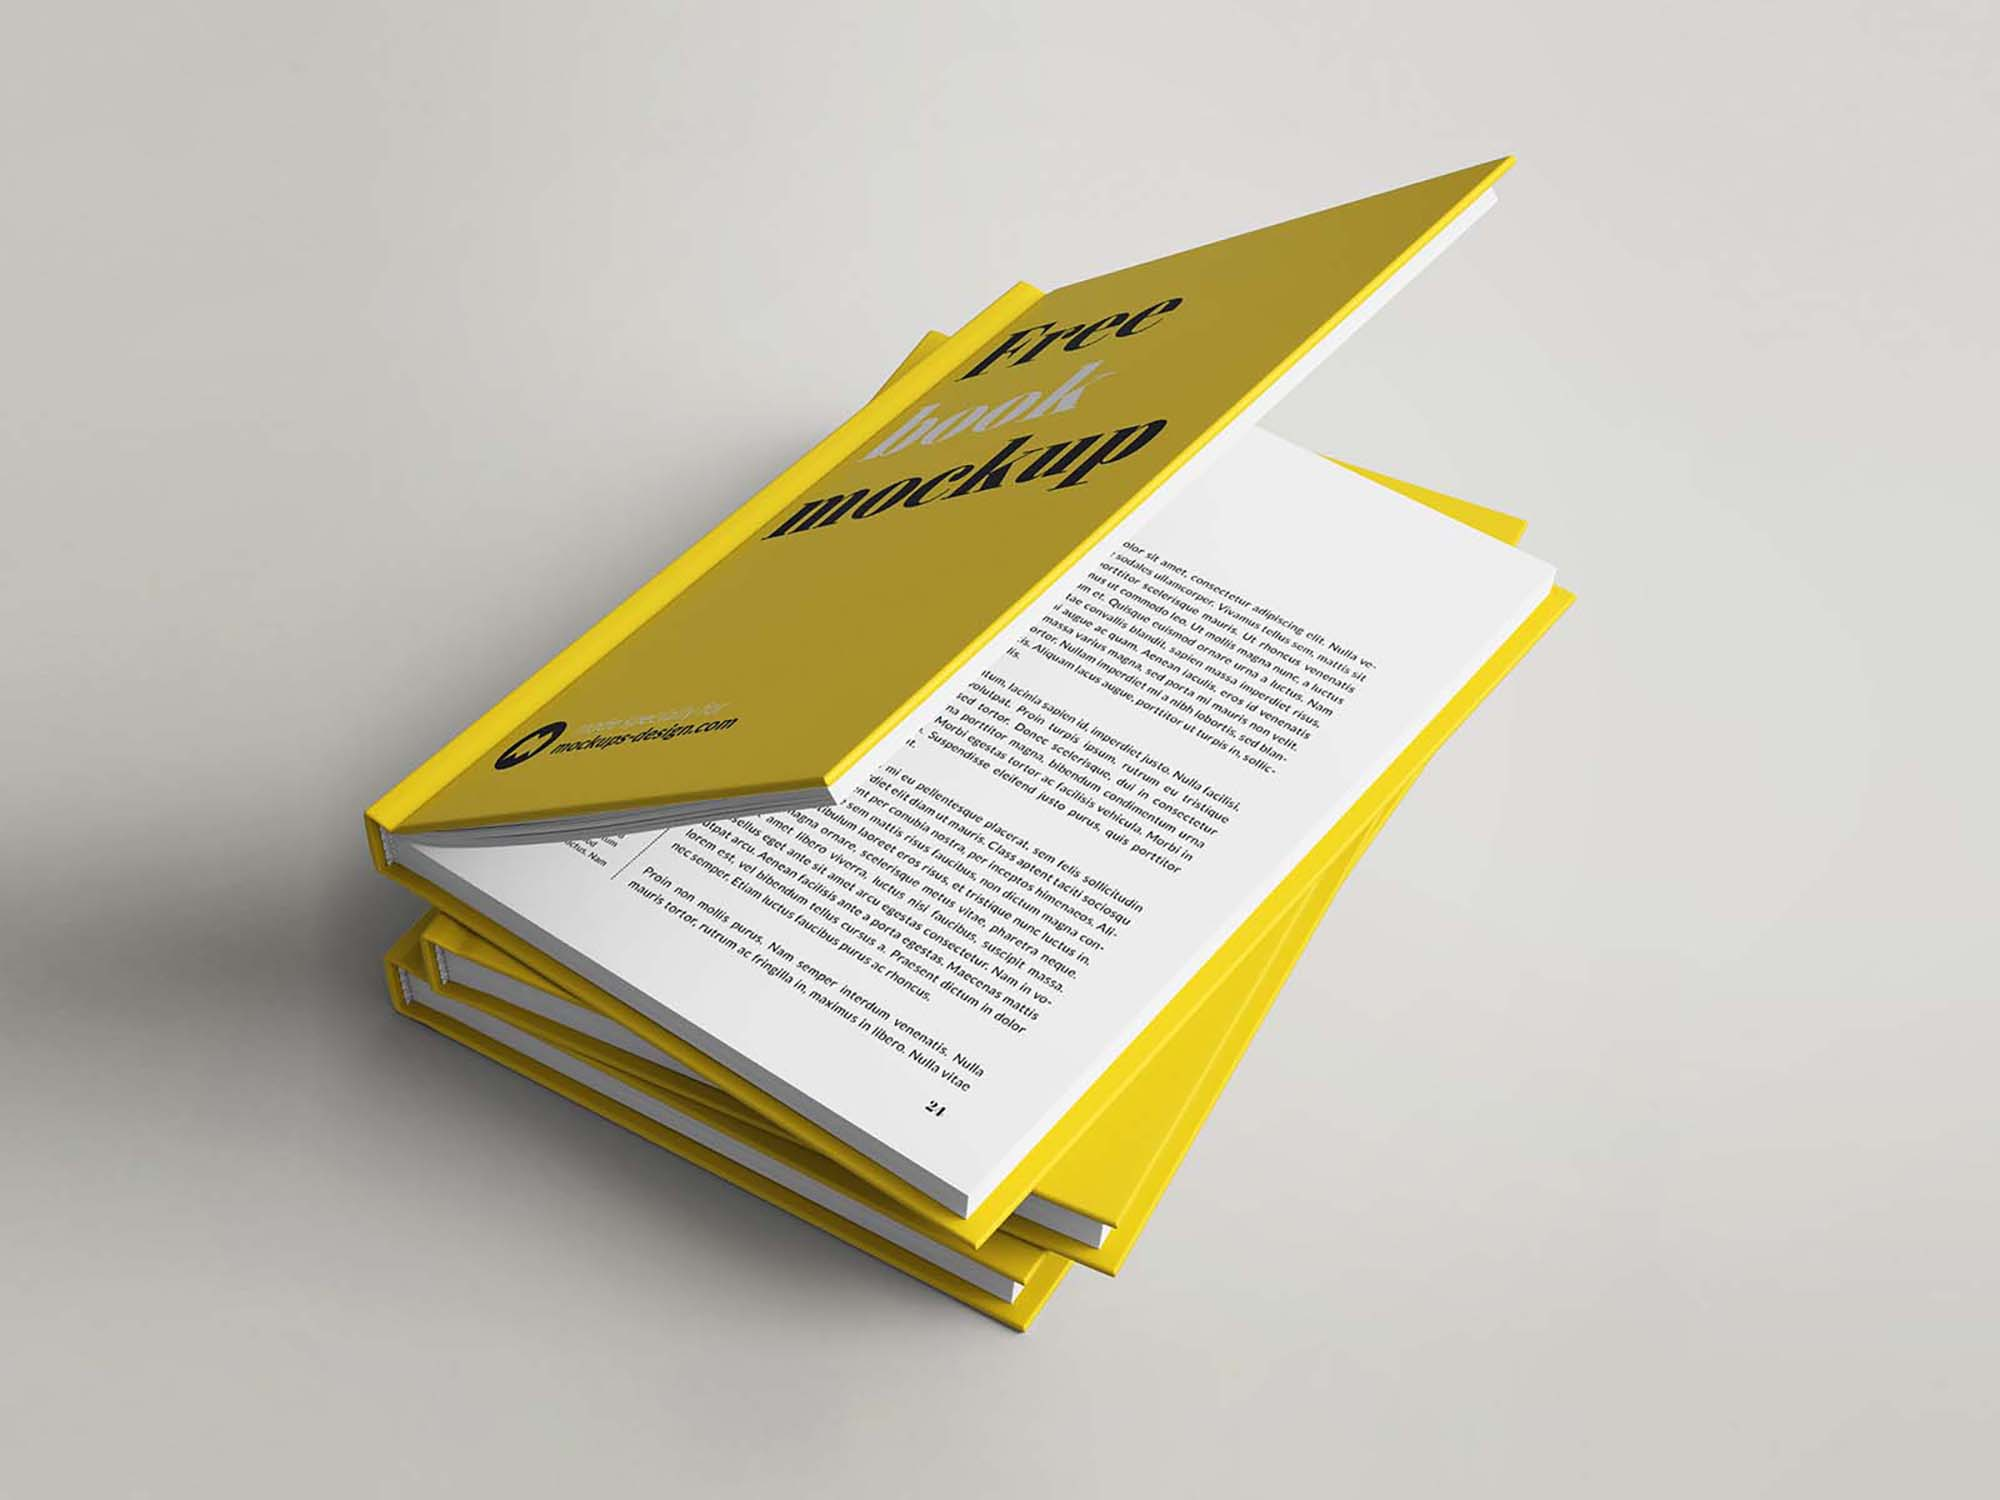 Hardcover Book Mockup 4